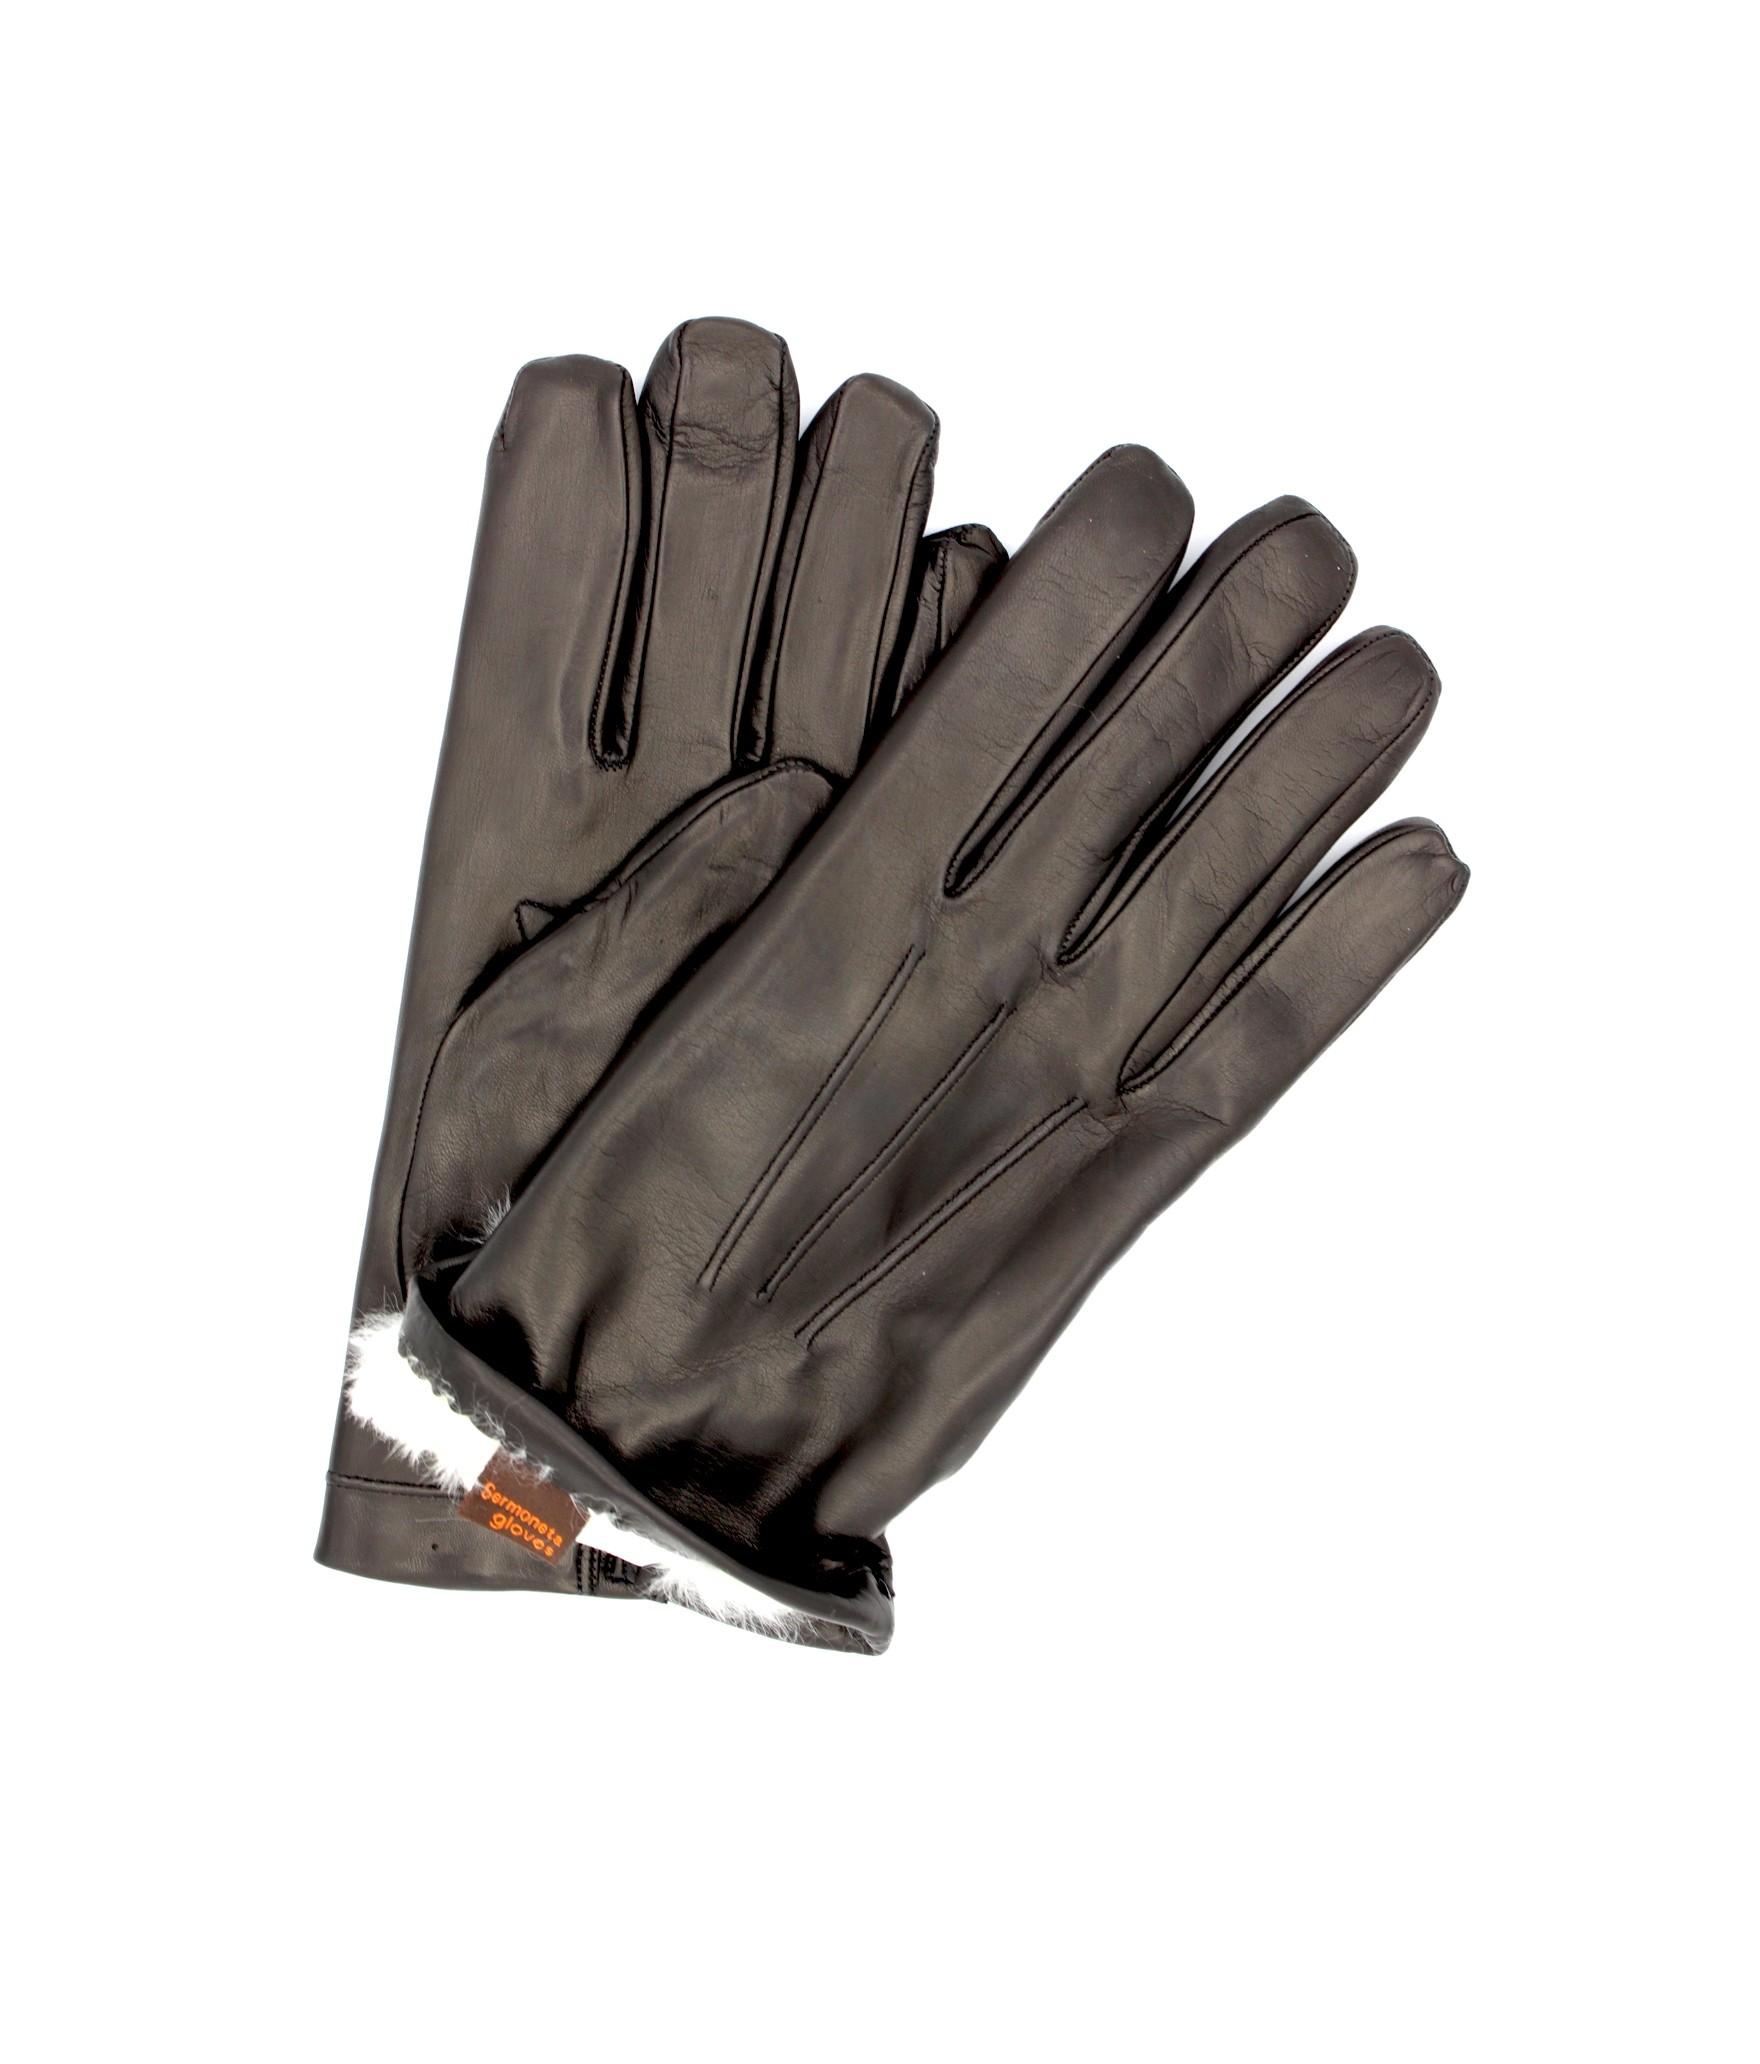 Nappa leather gloves 2bt Rabbit fur lined Black Sermoneta